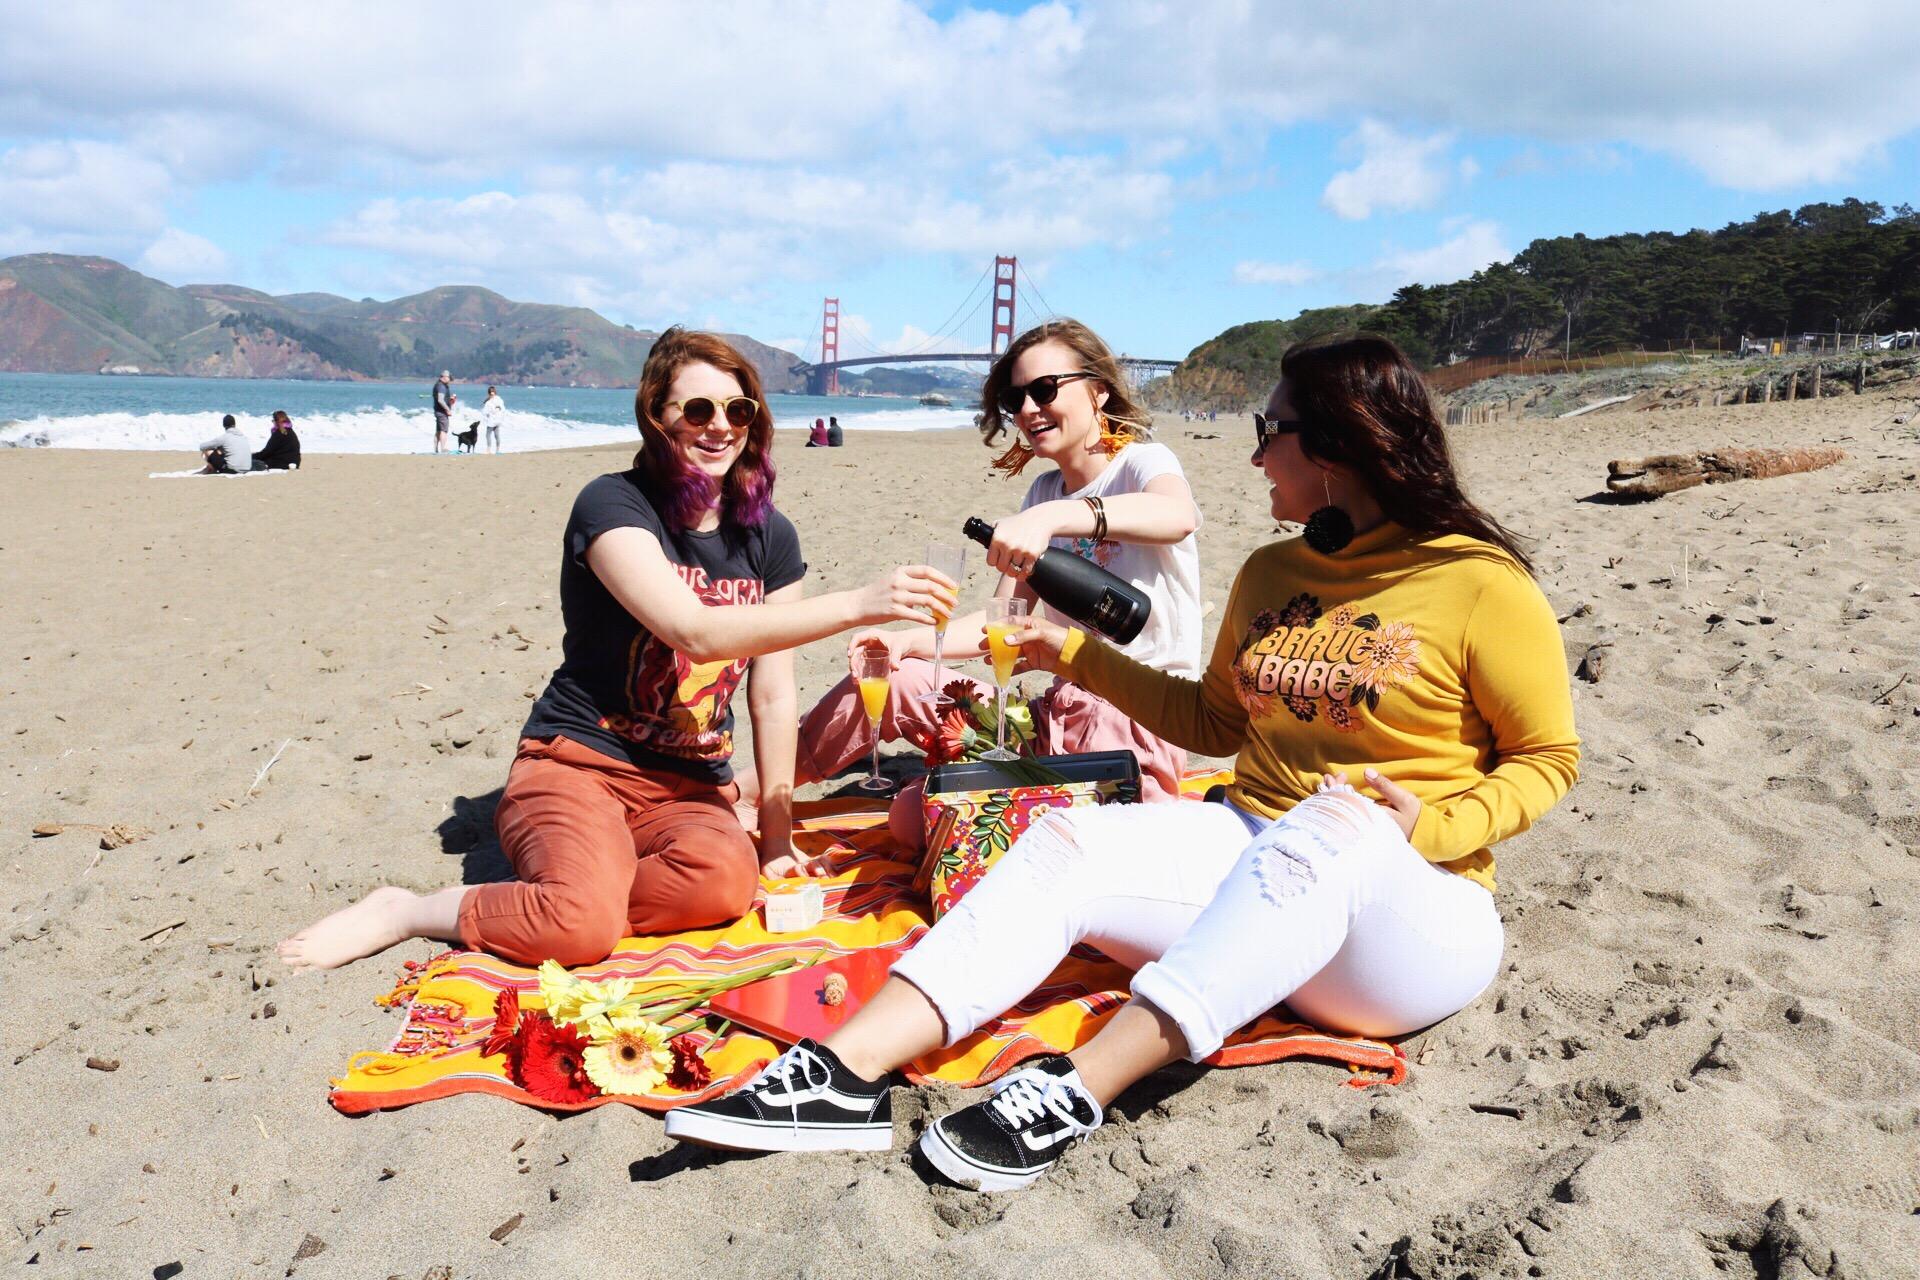 Daley_LA Feminist T-Shirts Black and White Classic Vans Distressed White Denim Orange Pants Mimosas San Fransisco Beach Picnic on the Beach Golden Gate Bridge